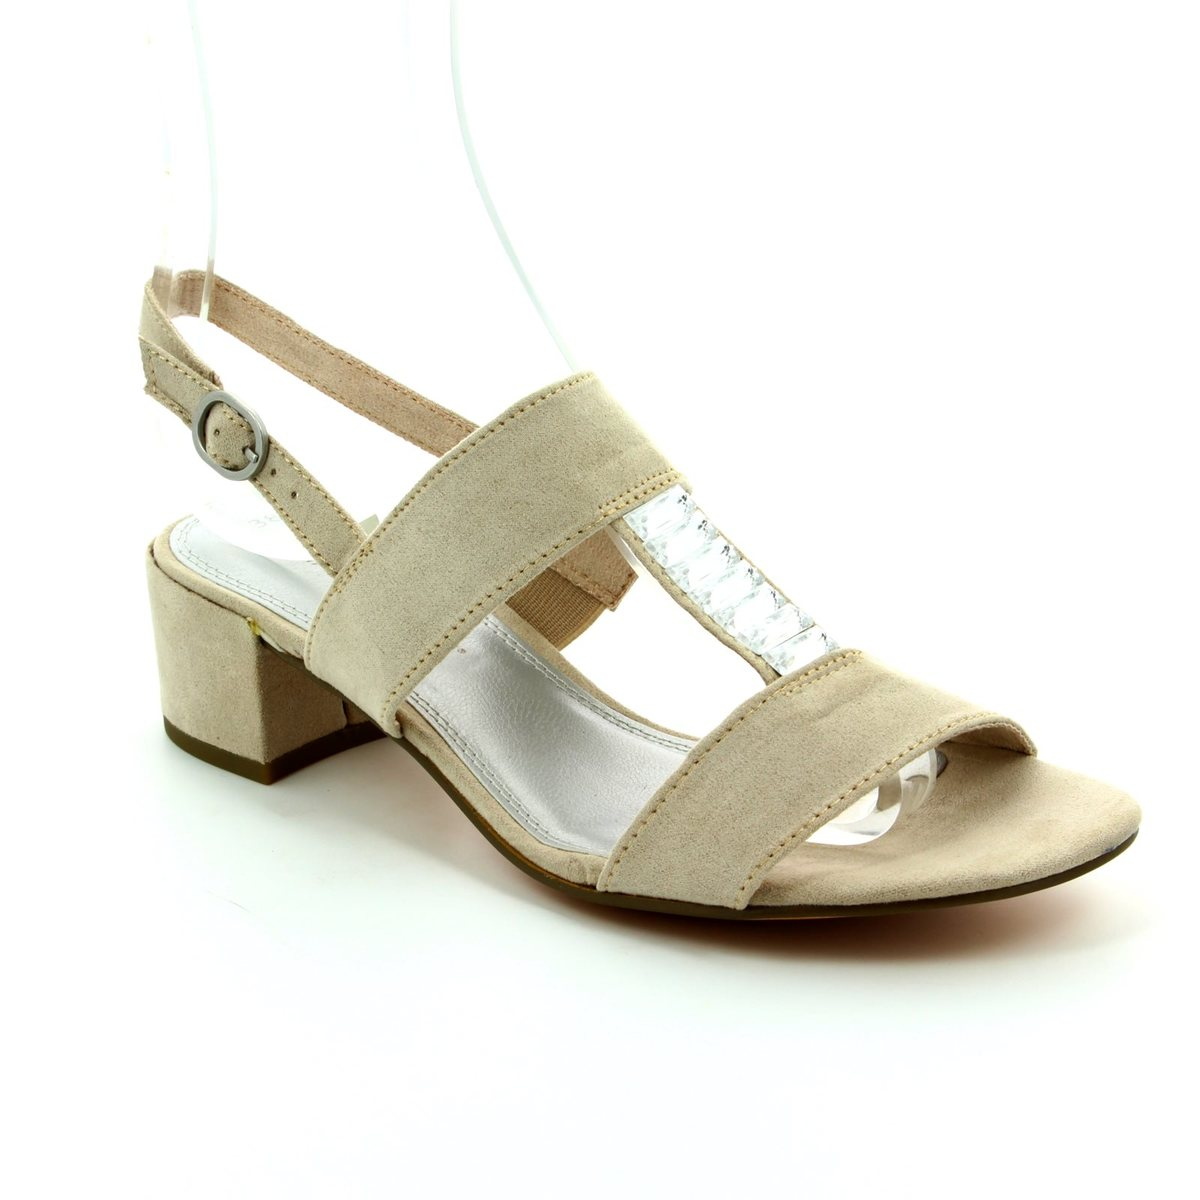 Womens 28202 Sling Back Sandals, Black, 4 UK Marco Tozzi